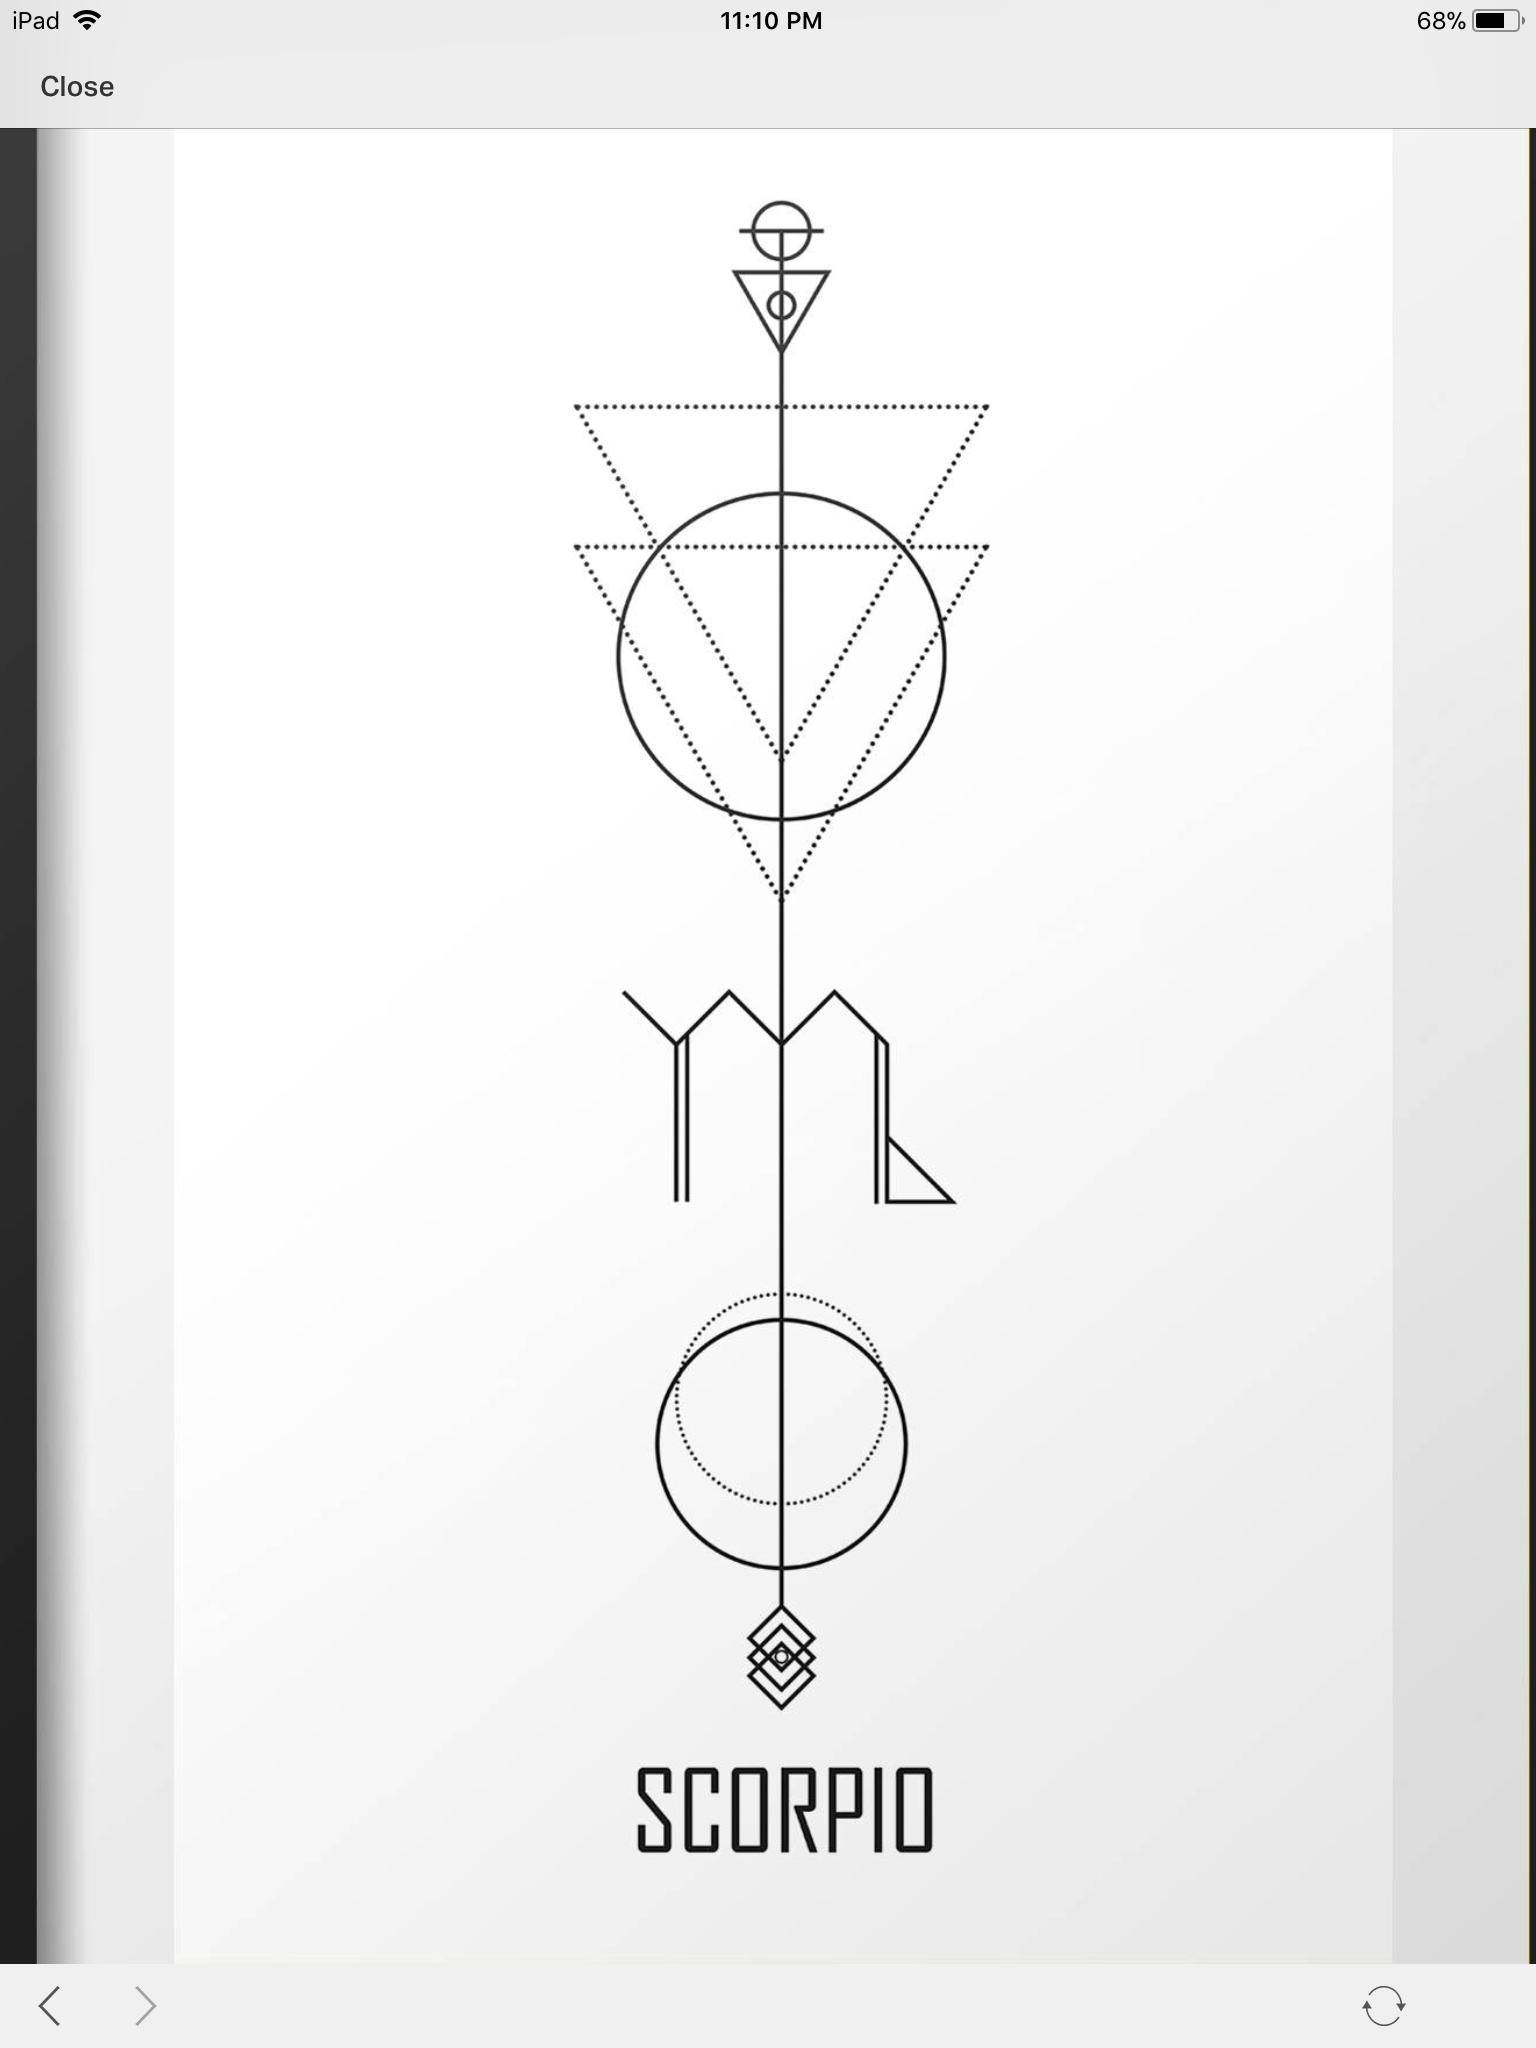 Photo of scorpio geometrical #constellationpiercing scorpio geometrical